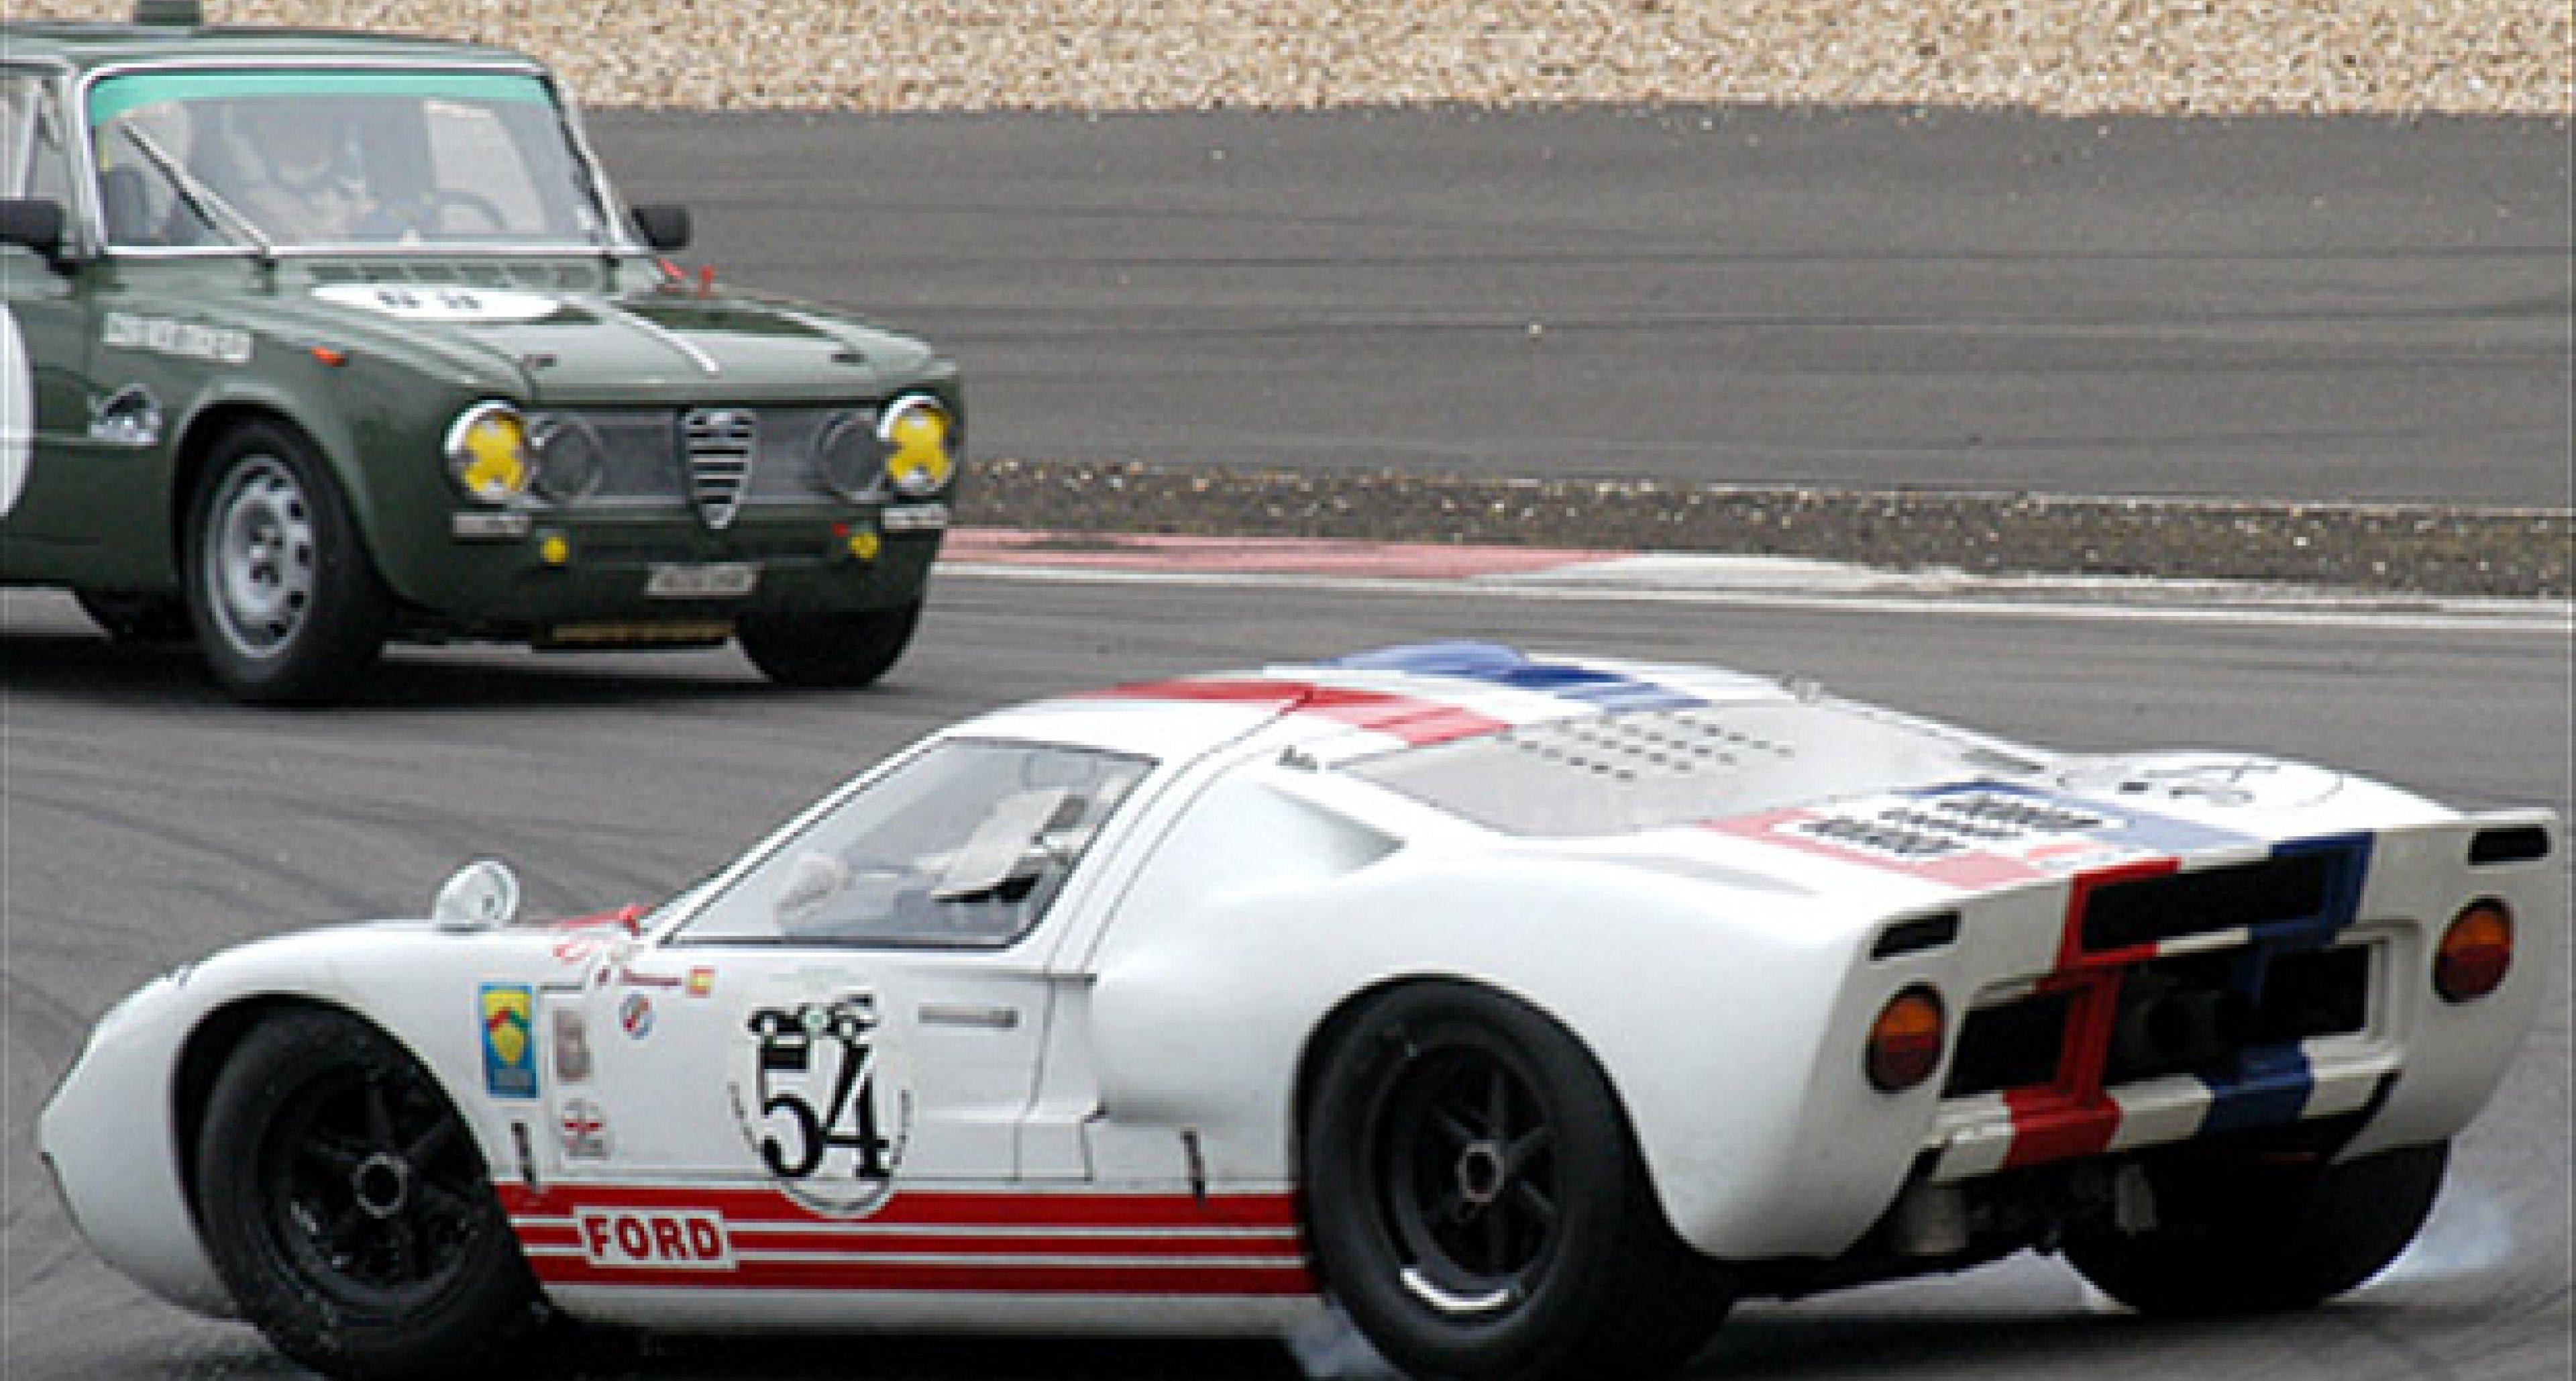 Rückblick – FHR Historischer Langstrecken Cup am Nürburgring